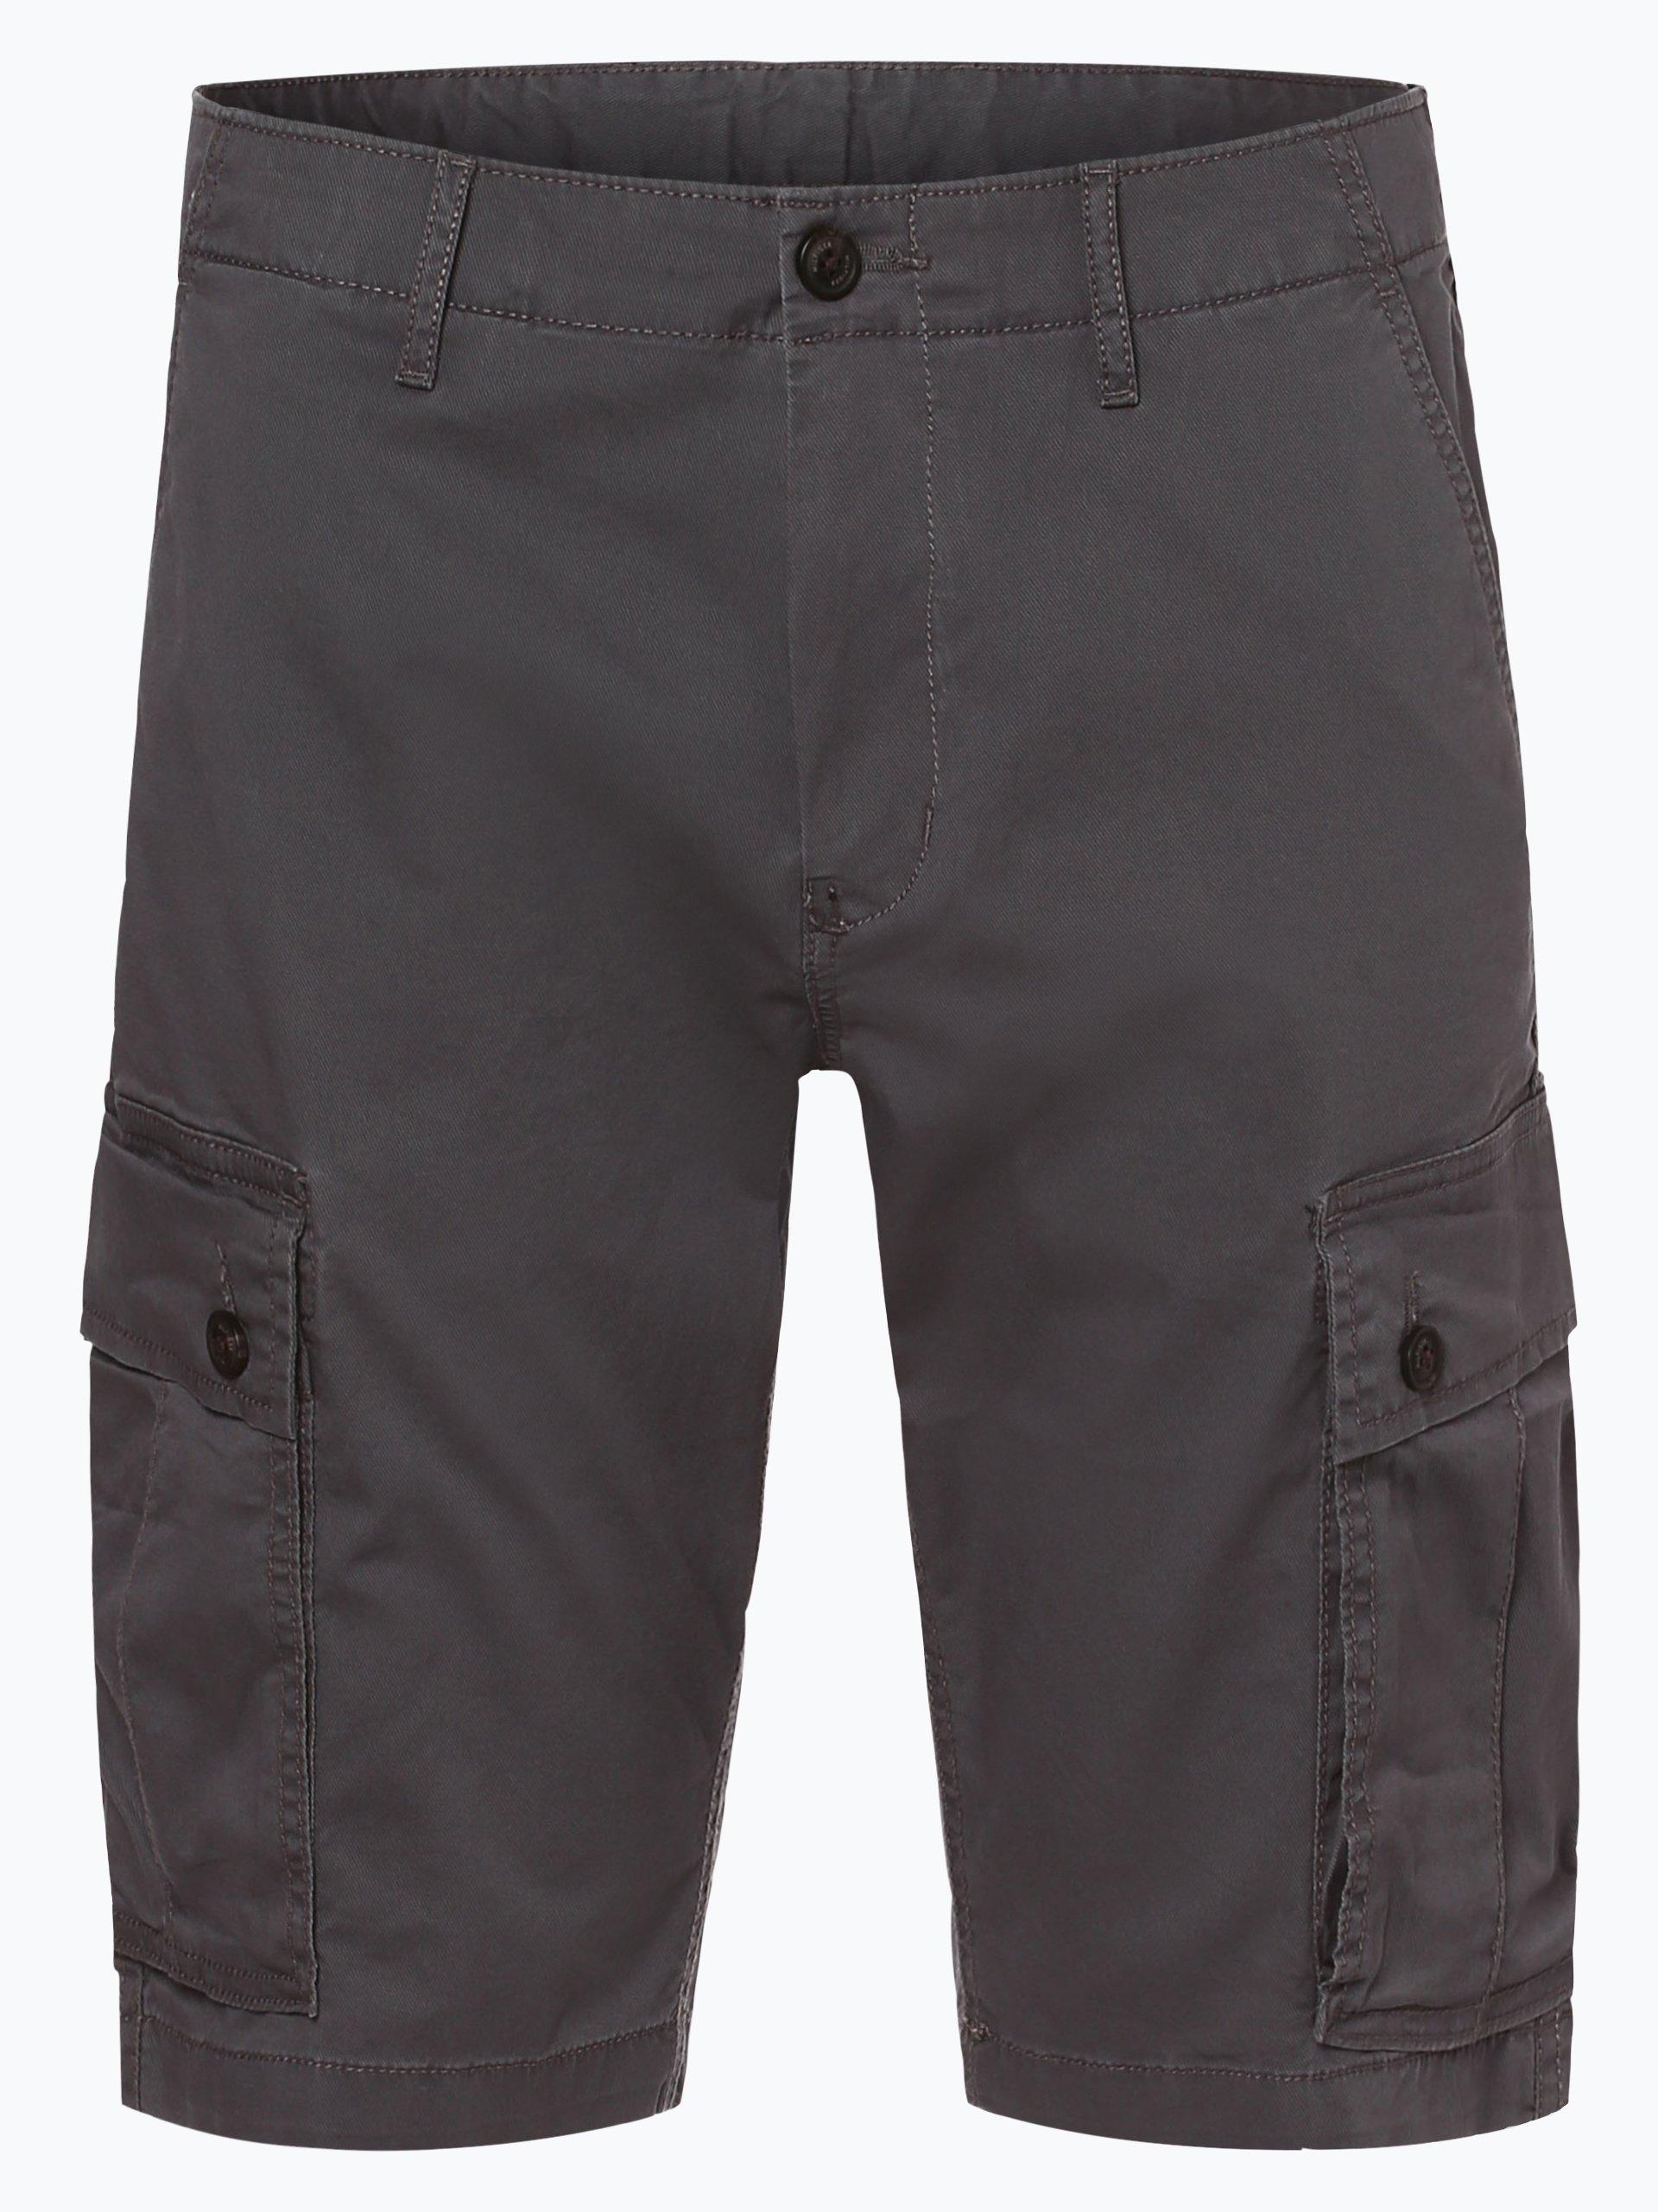 Tommy Hilfiger Herren Shorts - John Cargo Short